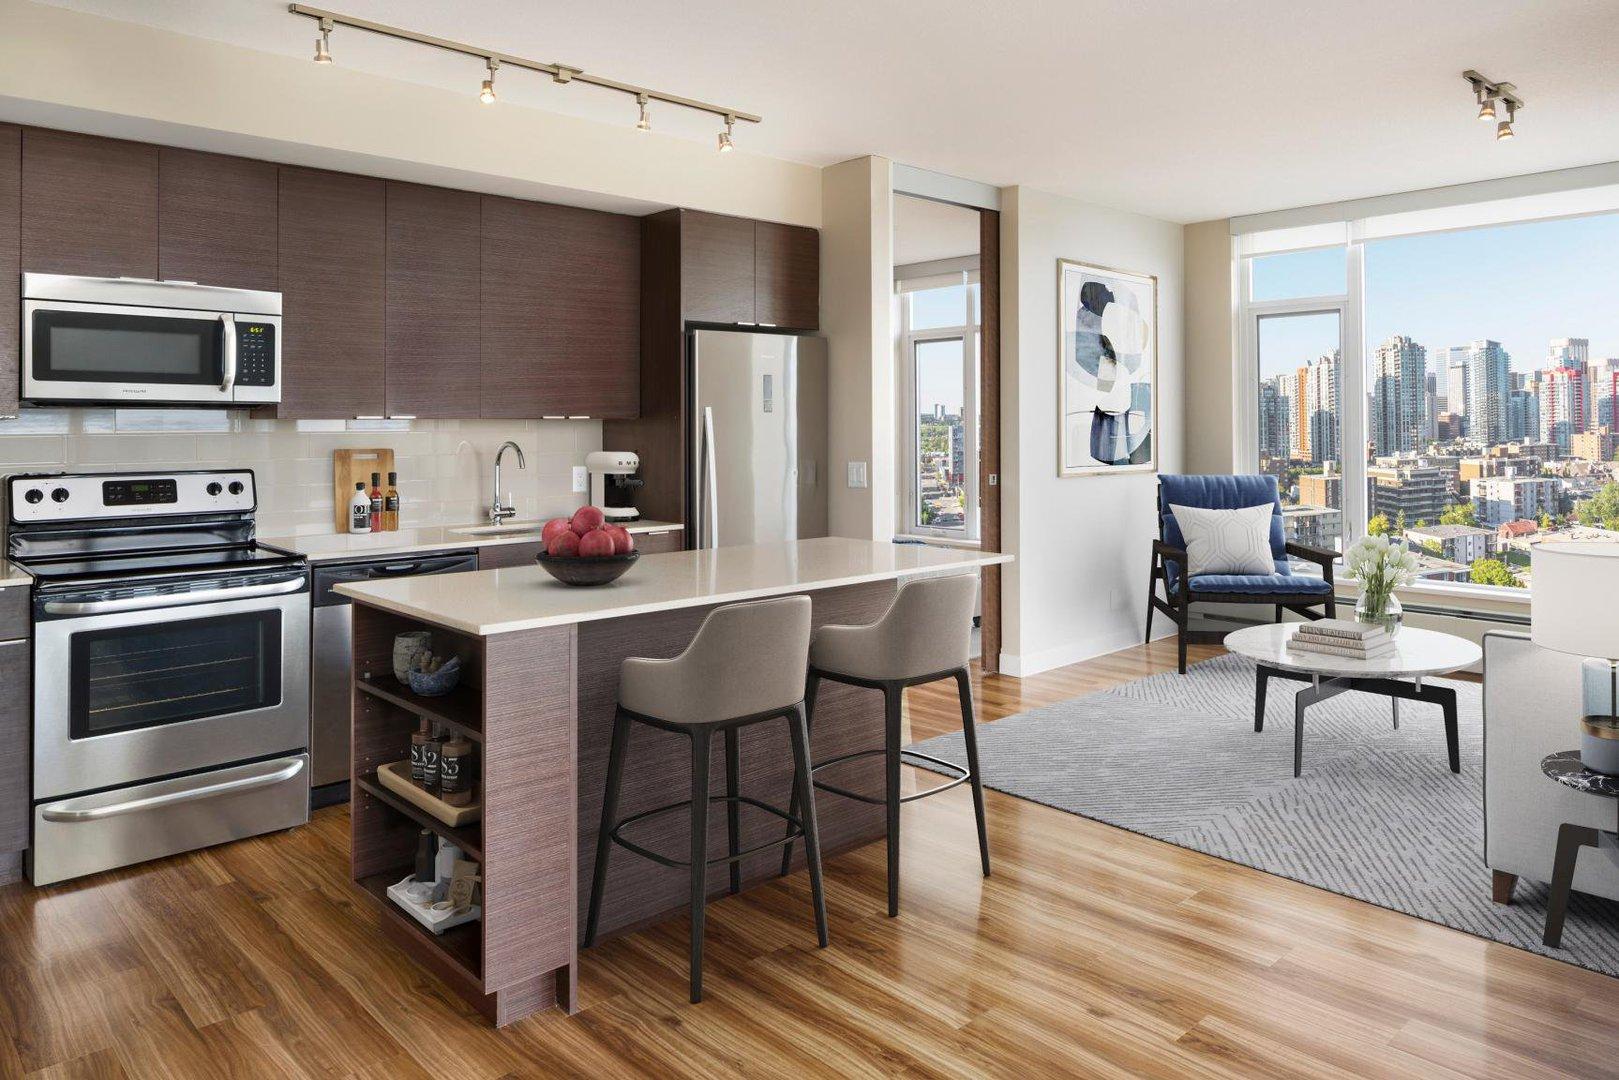 Apartment For Rent Calgary Alberta - asbackgammonboardsabout